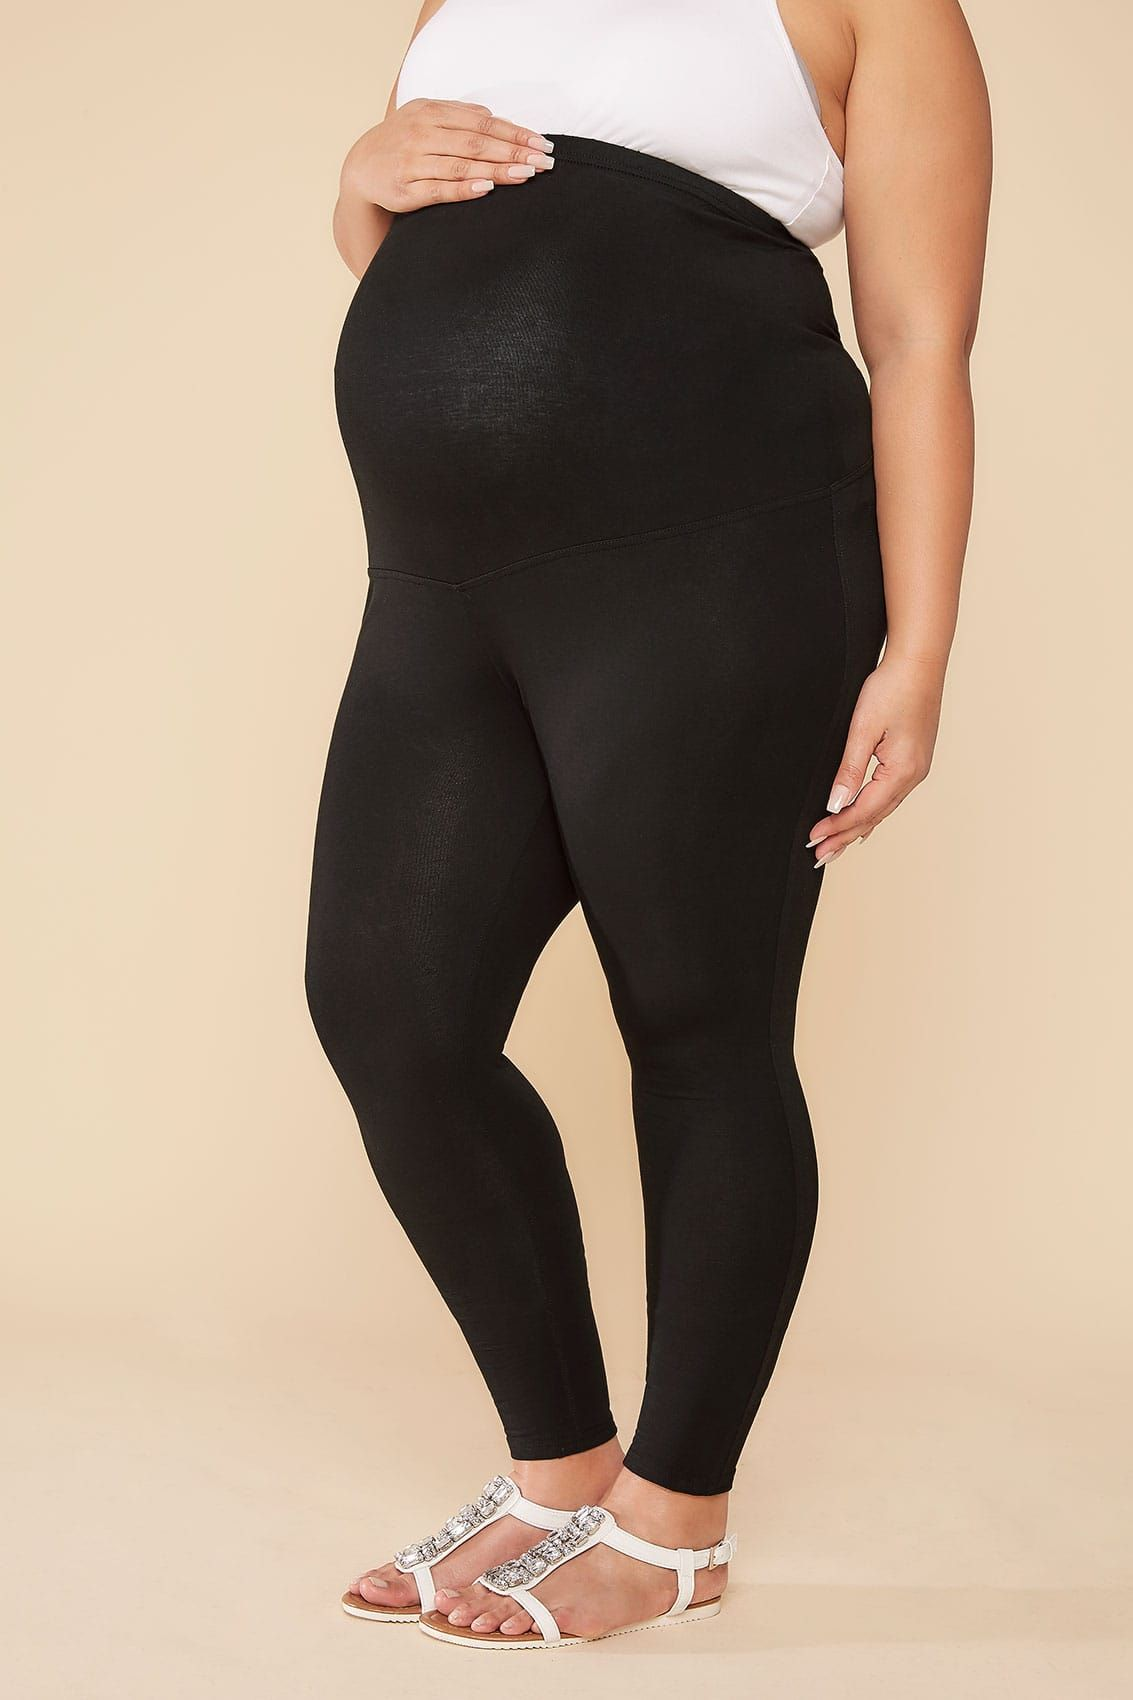 75f190fadeba8 BUMP IT UP MATERNITY Black Cotton Elastane Leggings With Comfort Panel